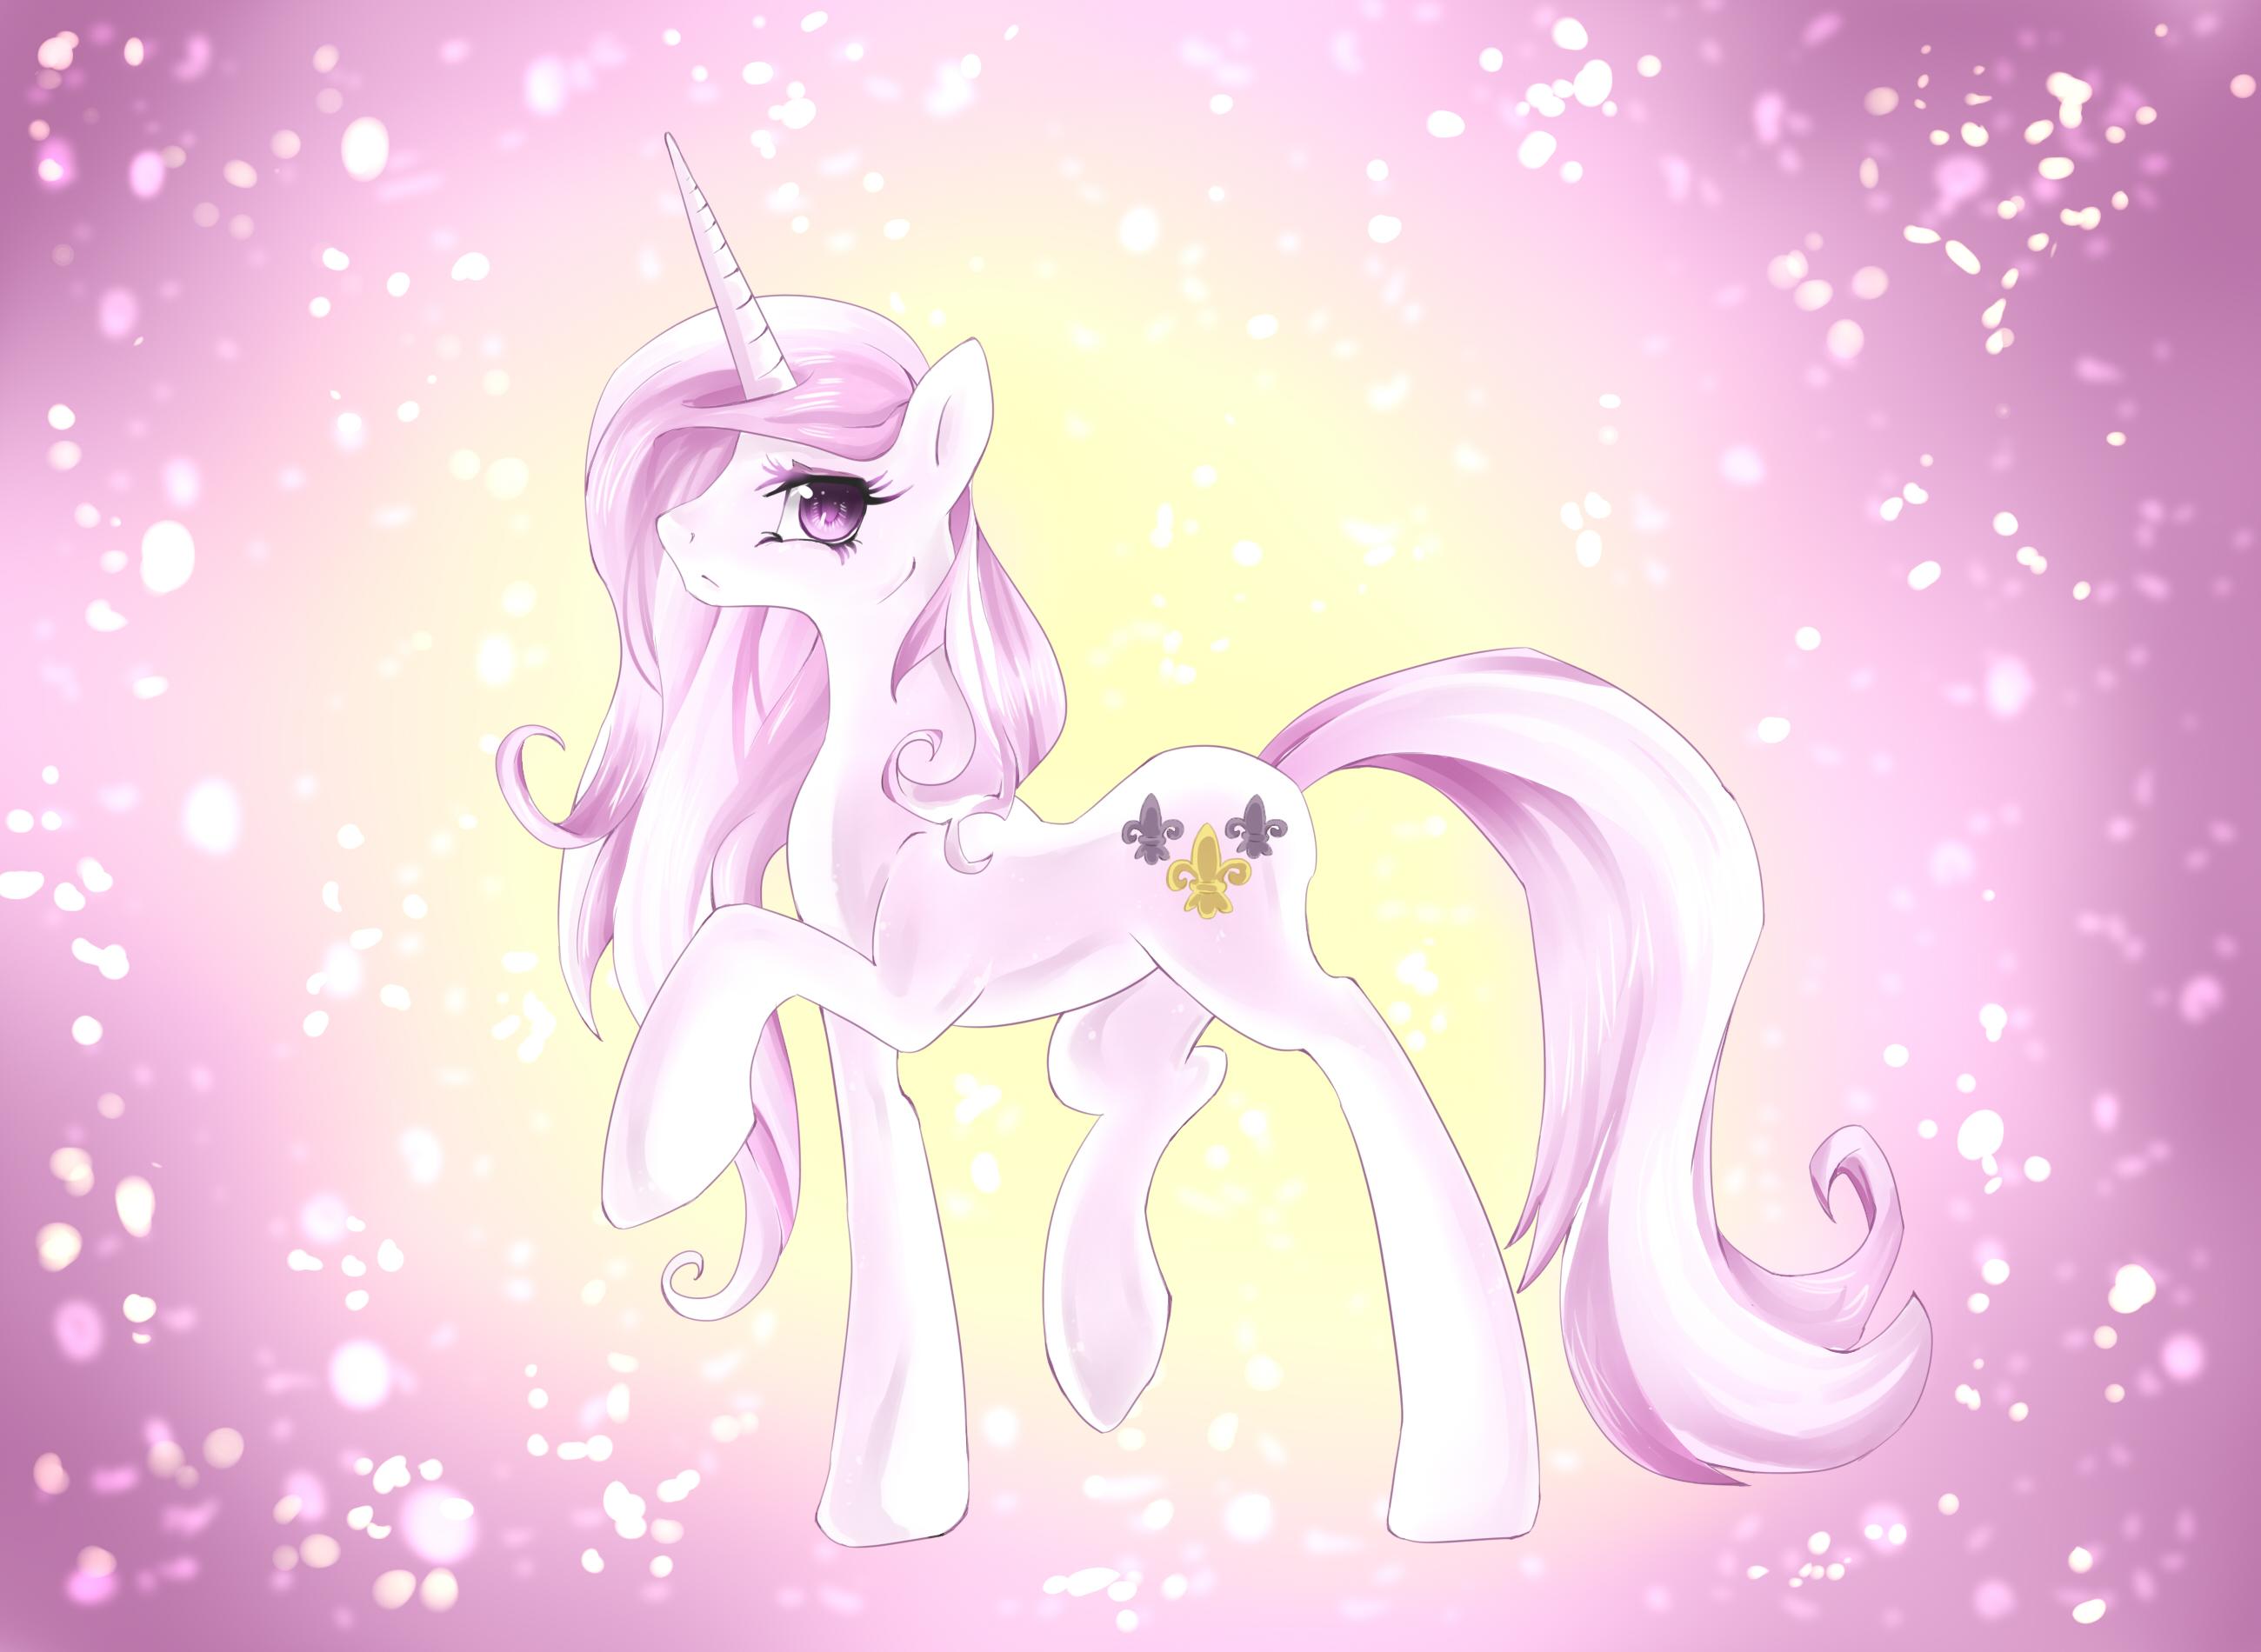 Fleur De Lis My Little Pony Image Bronies Of Moddb Mod Db